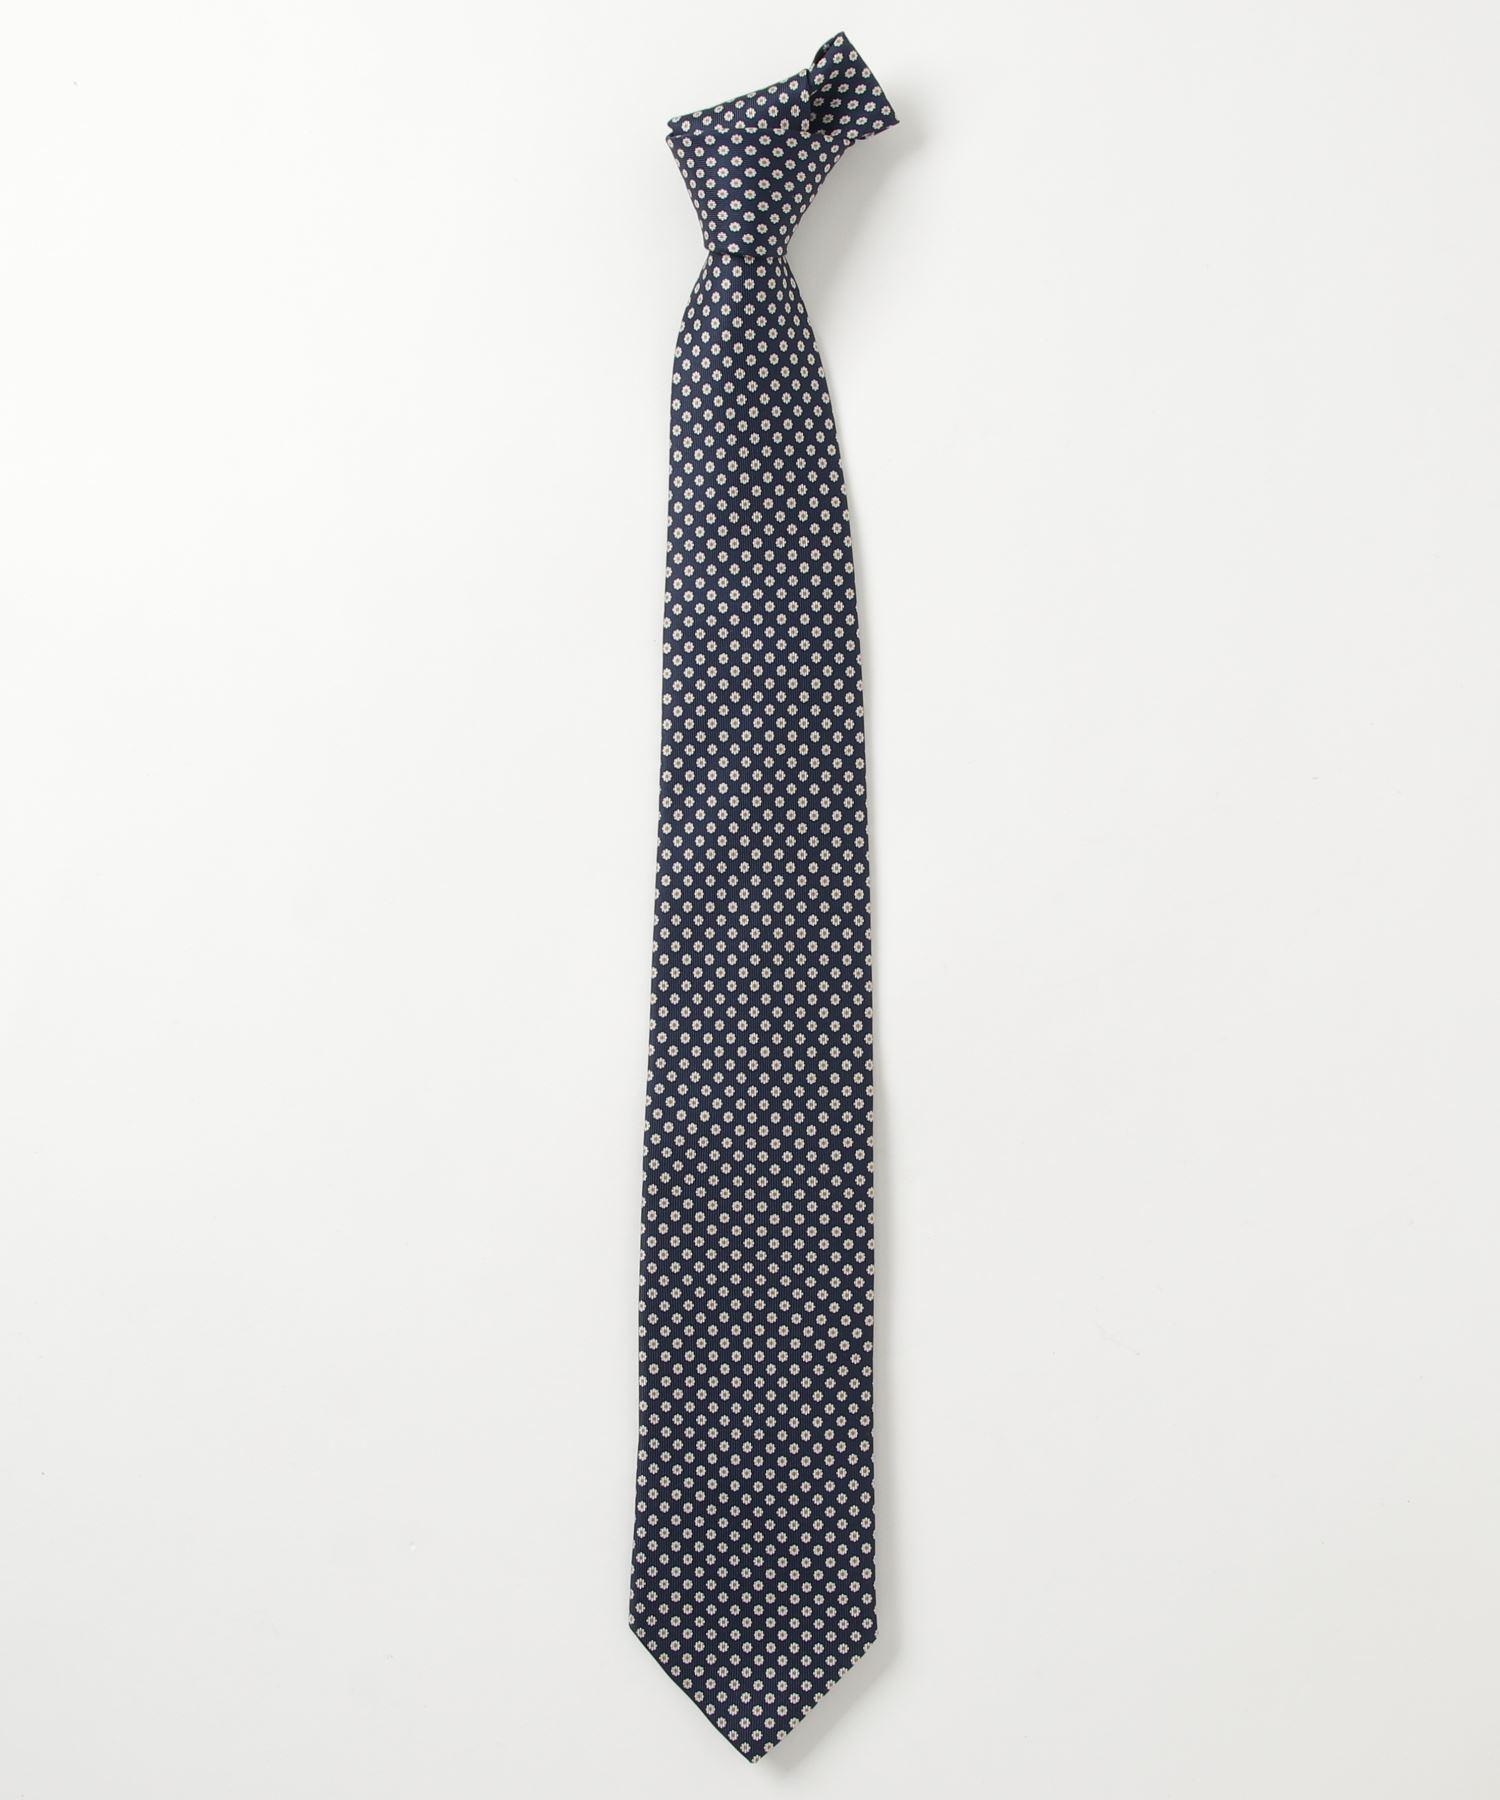 STEFANO BIGI / 小紋柄ネクタイ